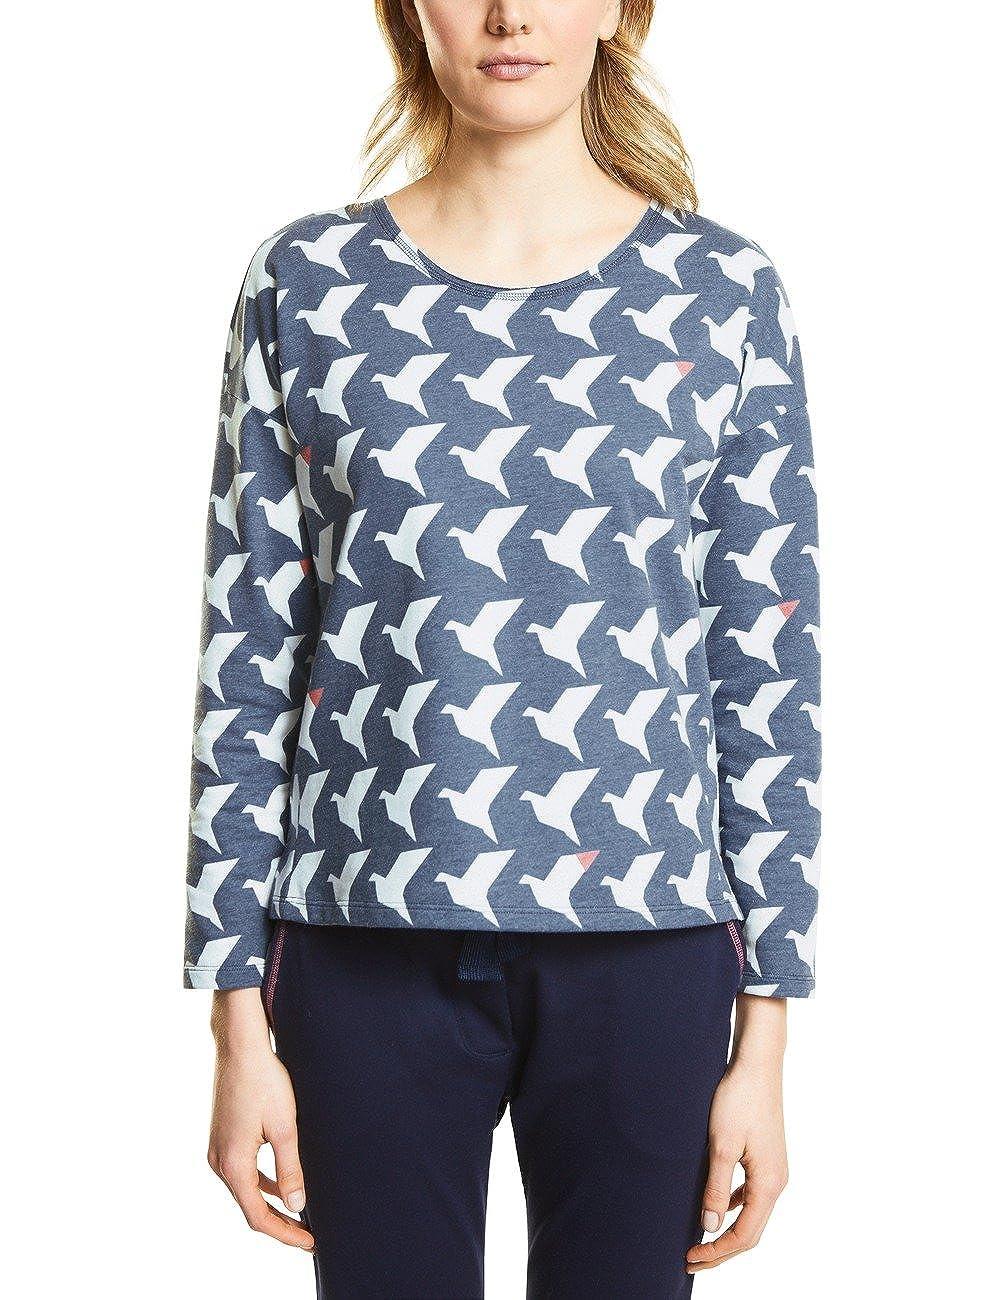 shirt Blue Sweat 300532 Femme 44 31151 evening Street One Multicolore qHtwWZ